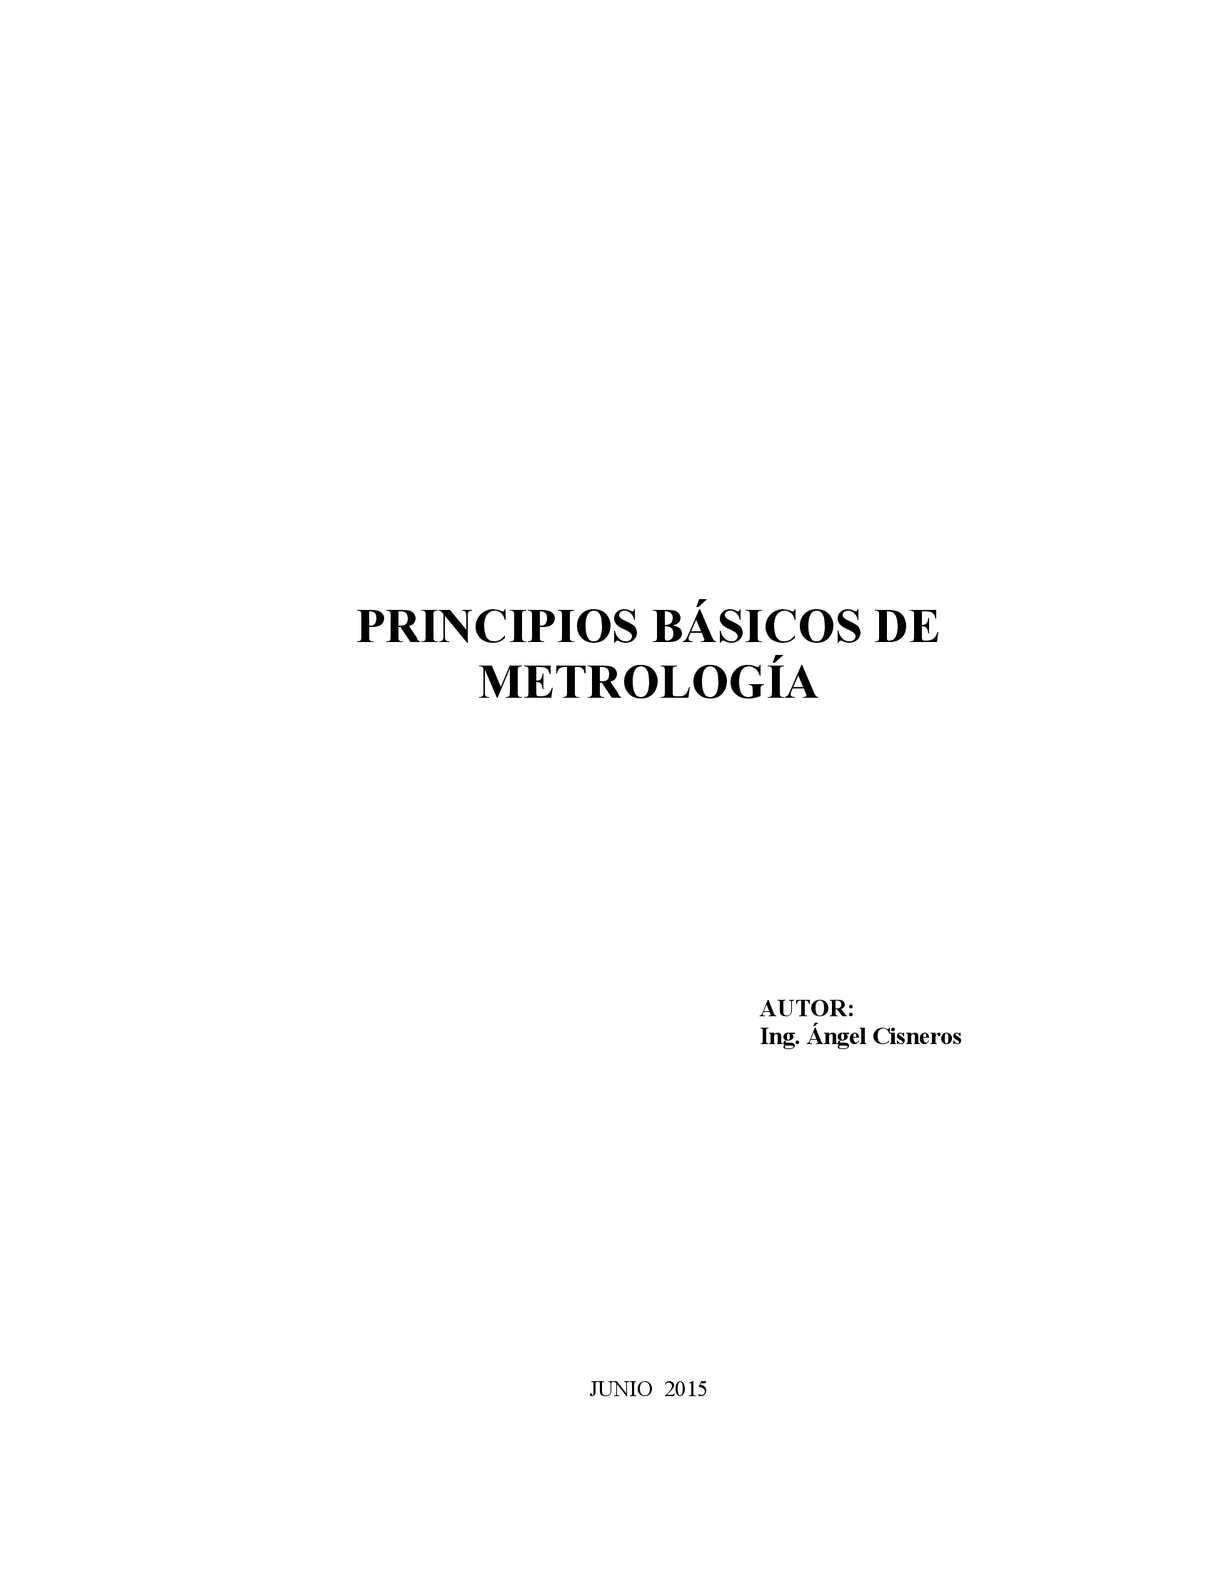 Prinicipios Basicos Metrologia